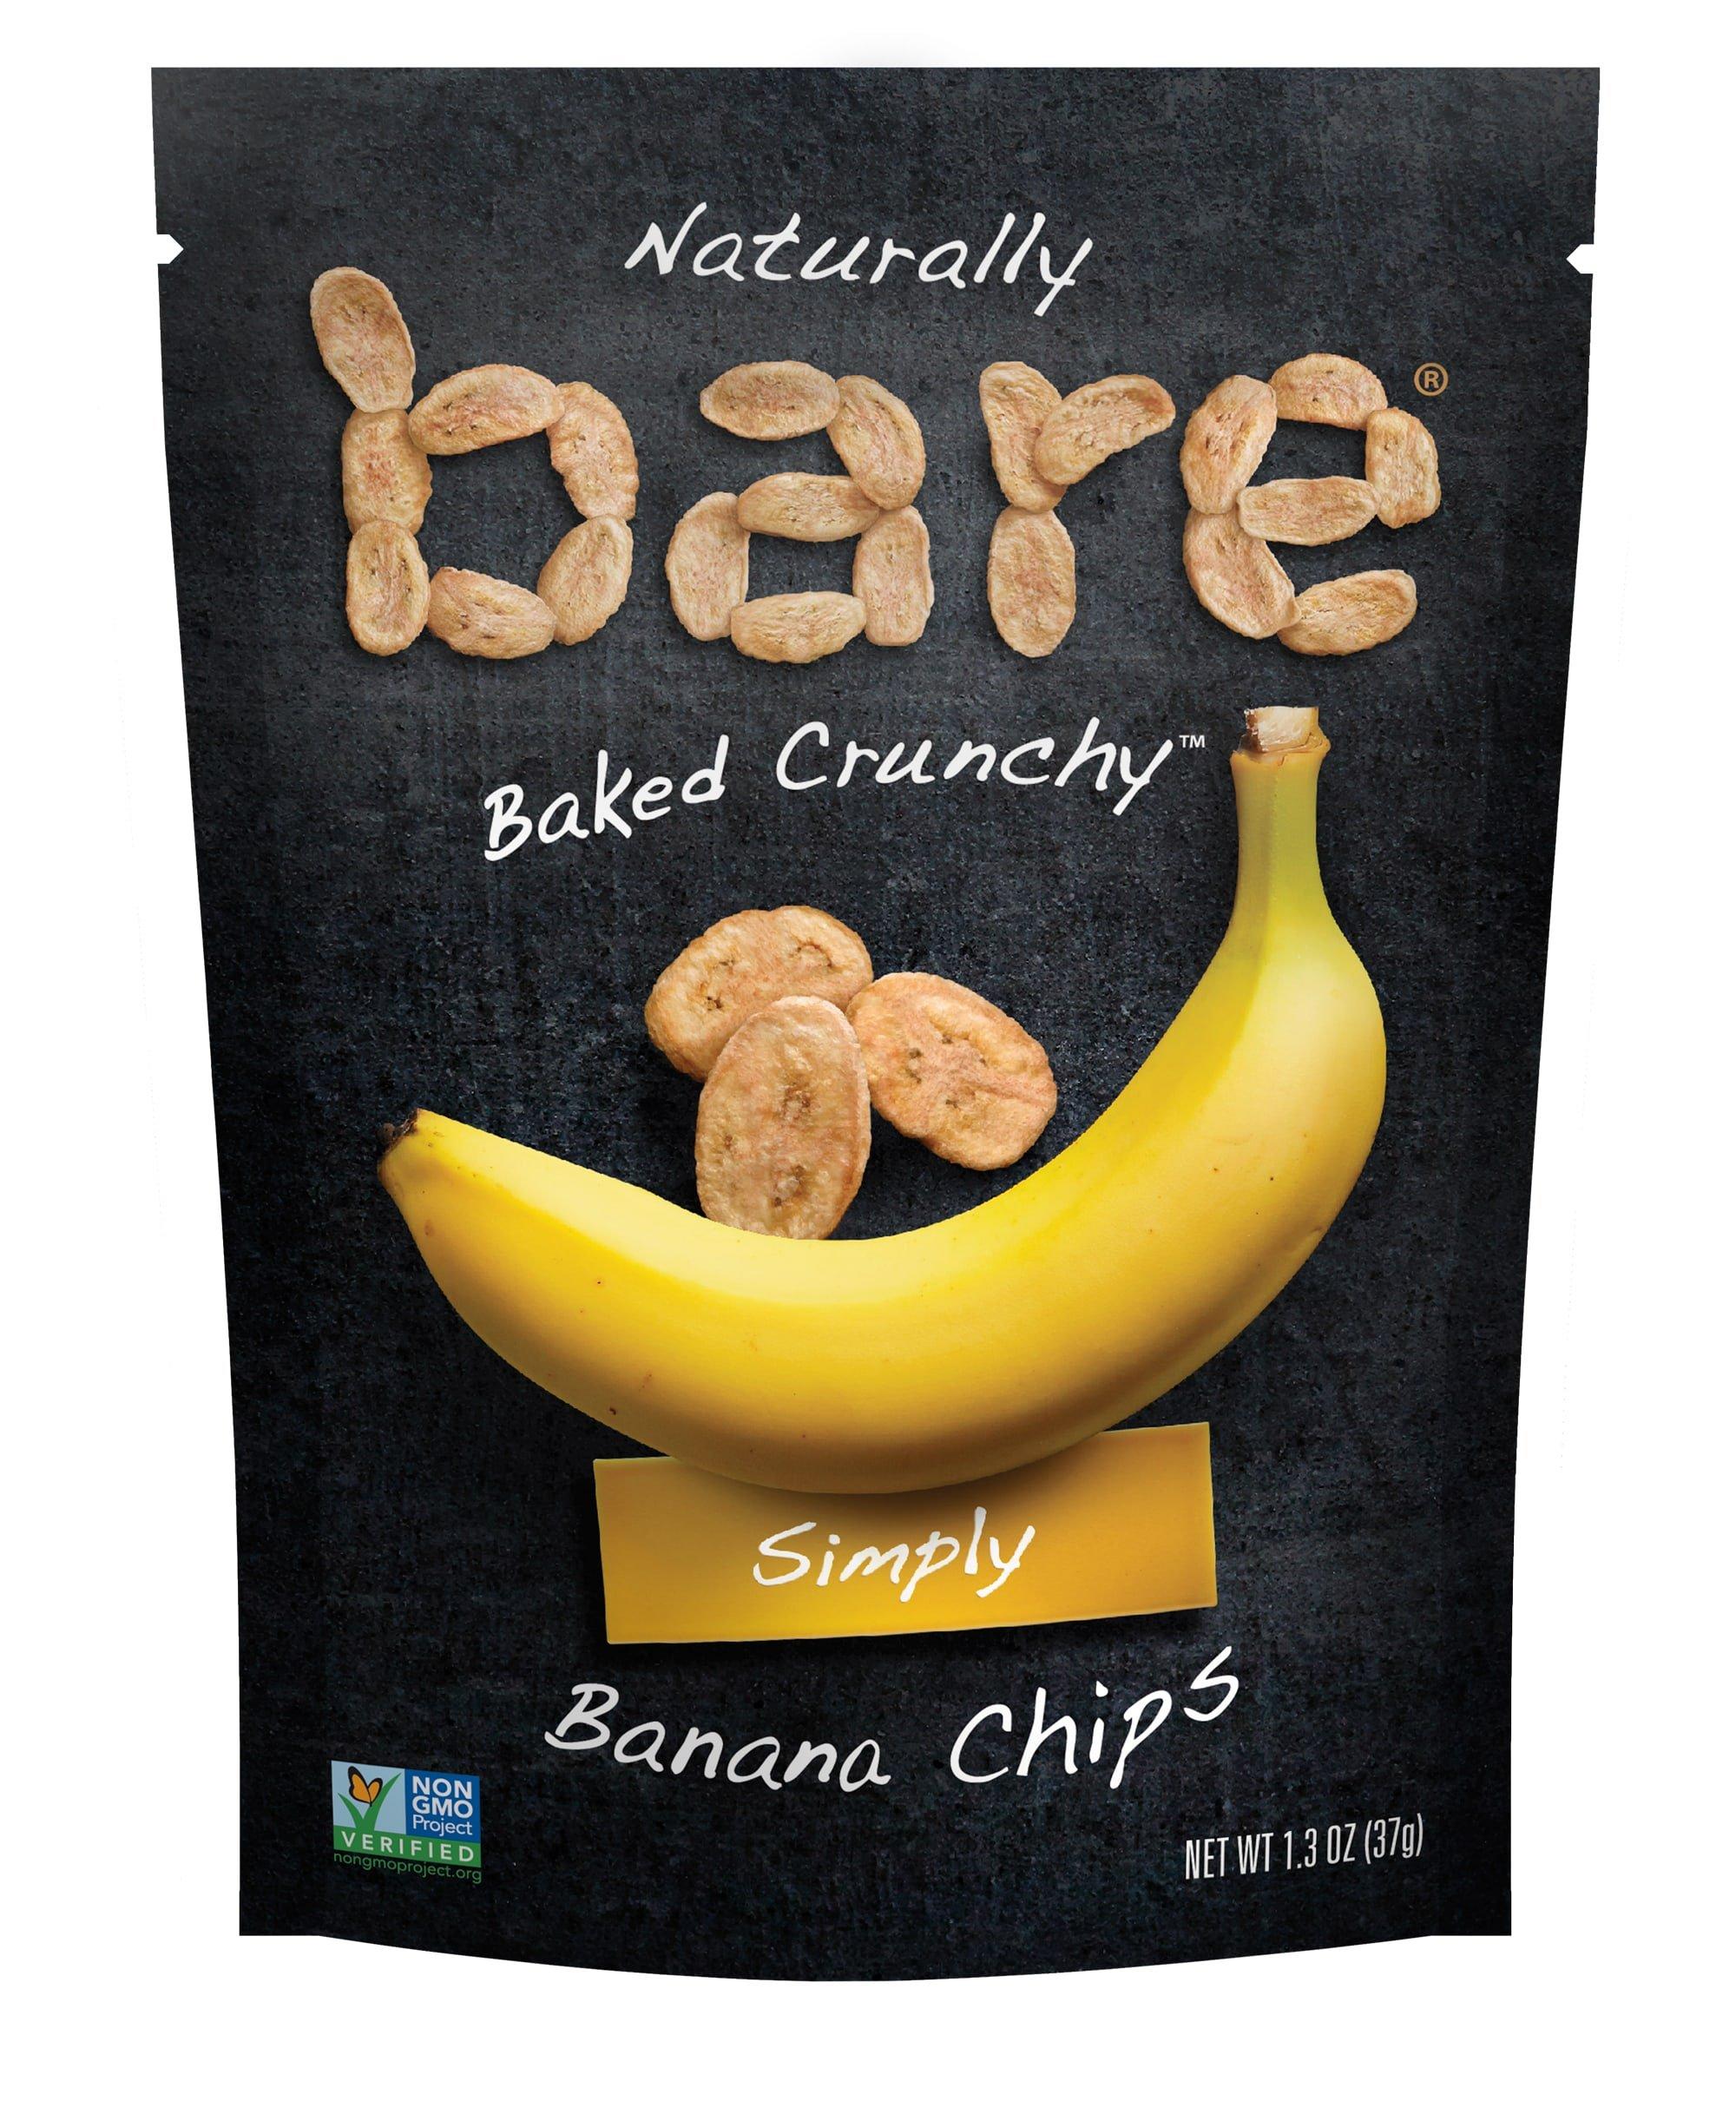 Bare B04PL013-8X6 1.3Oz Natural Banana Chips Simply: 48-Unit Master Case: Usa